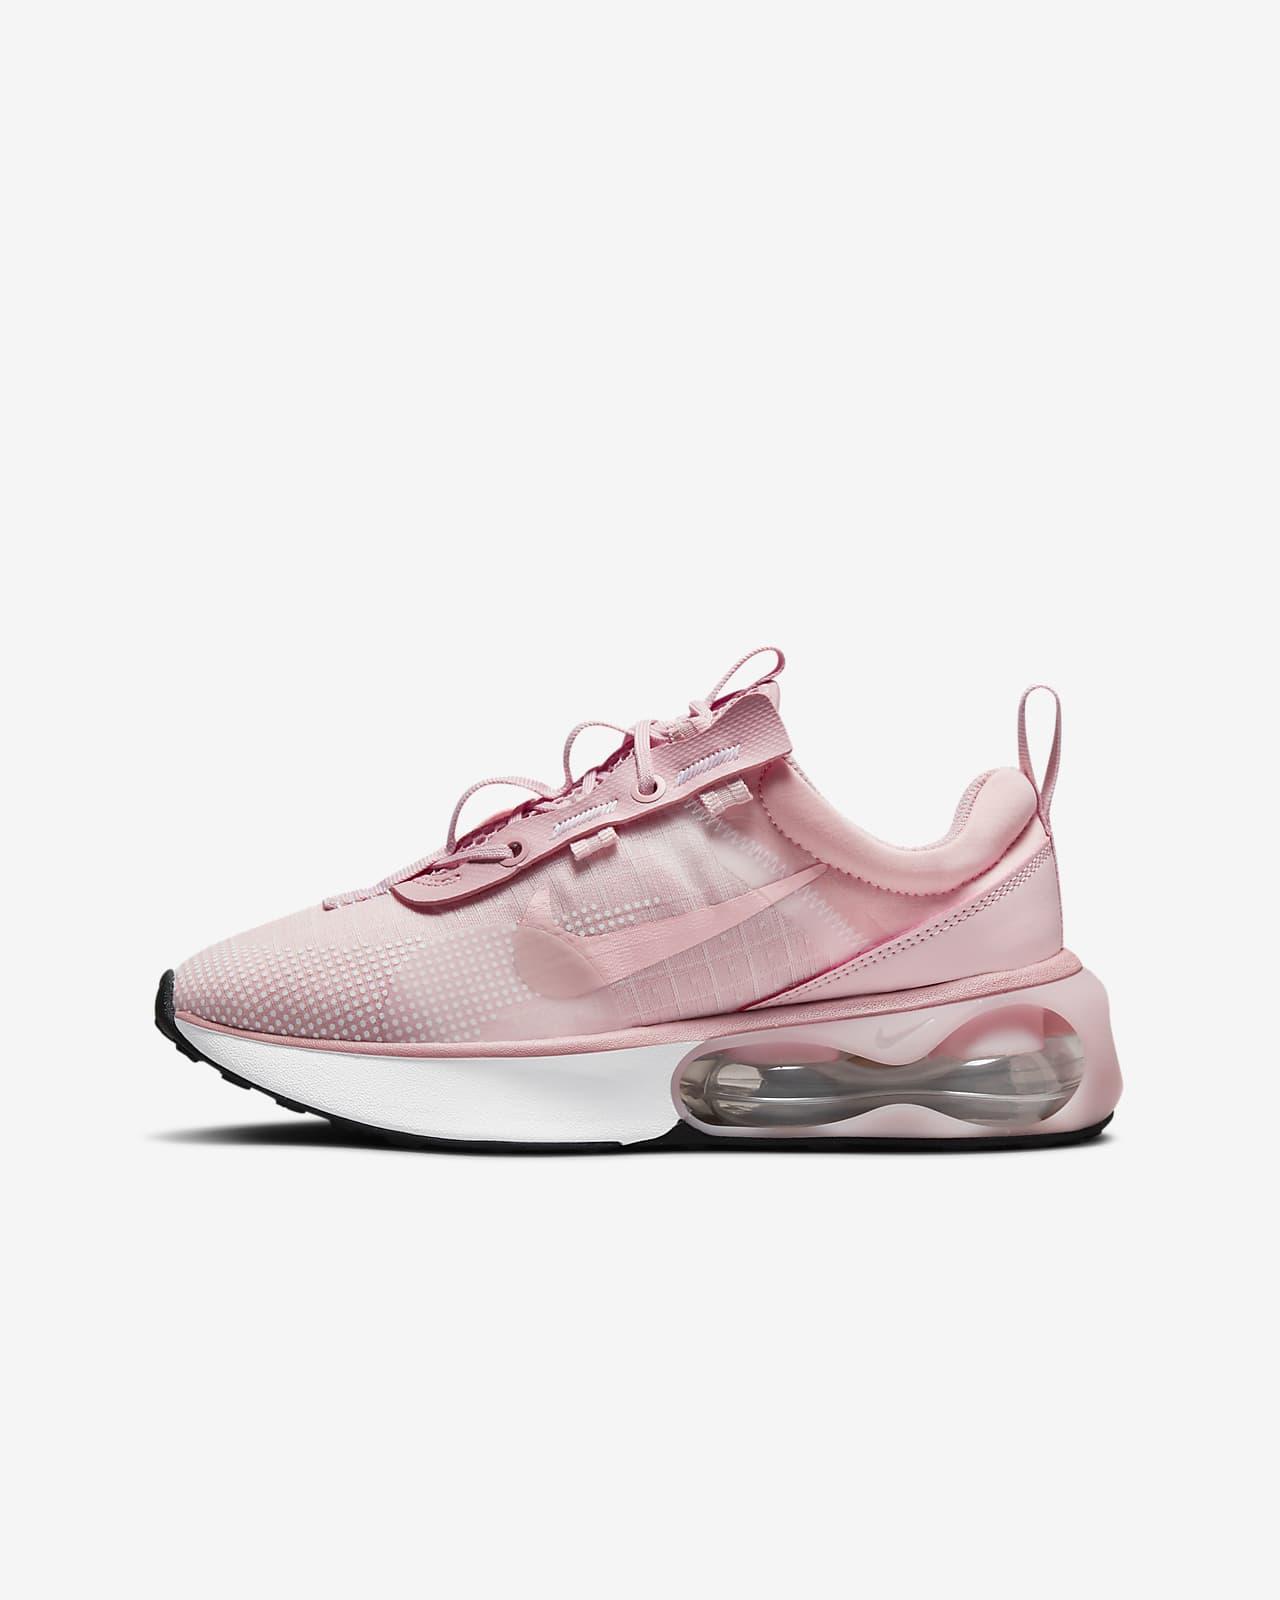 Nike Air Max 2021 Schuhe für ältere Kinder